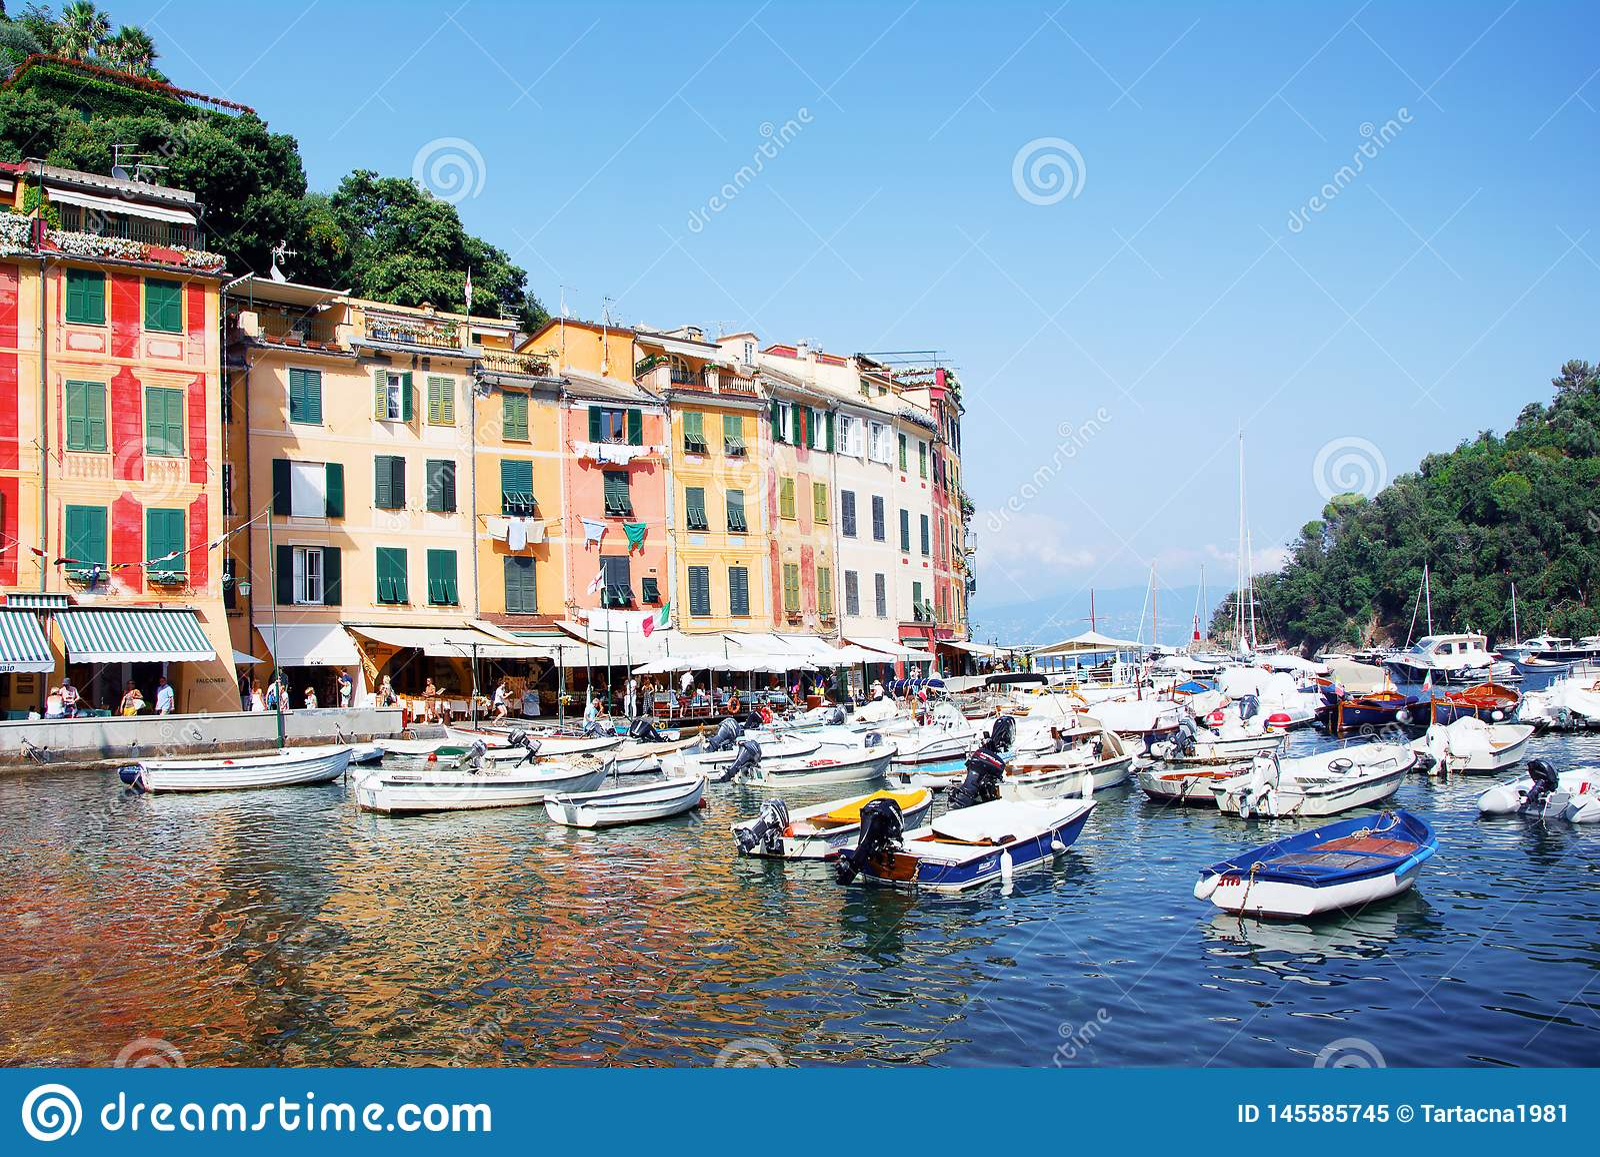 Haven, Portofino, Italië, Genua, Ligurië, 09 augustus, 18: De lopende toeristen, comfortabele koffie, kleurden huizen, boatsin de